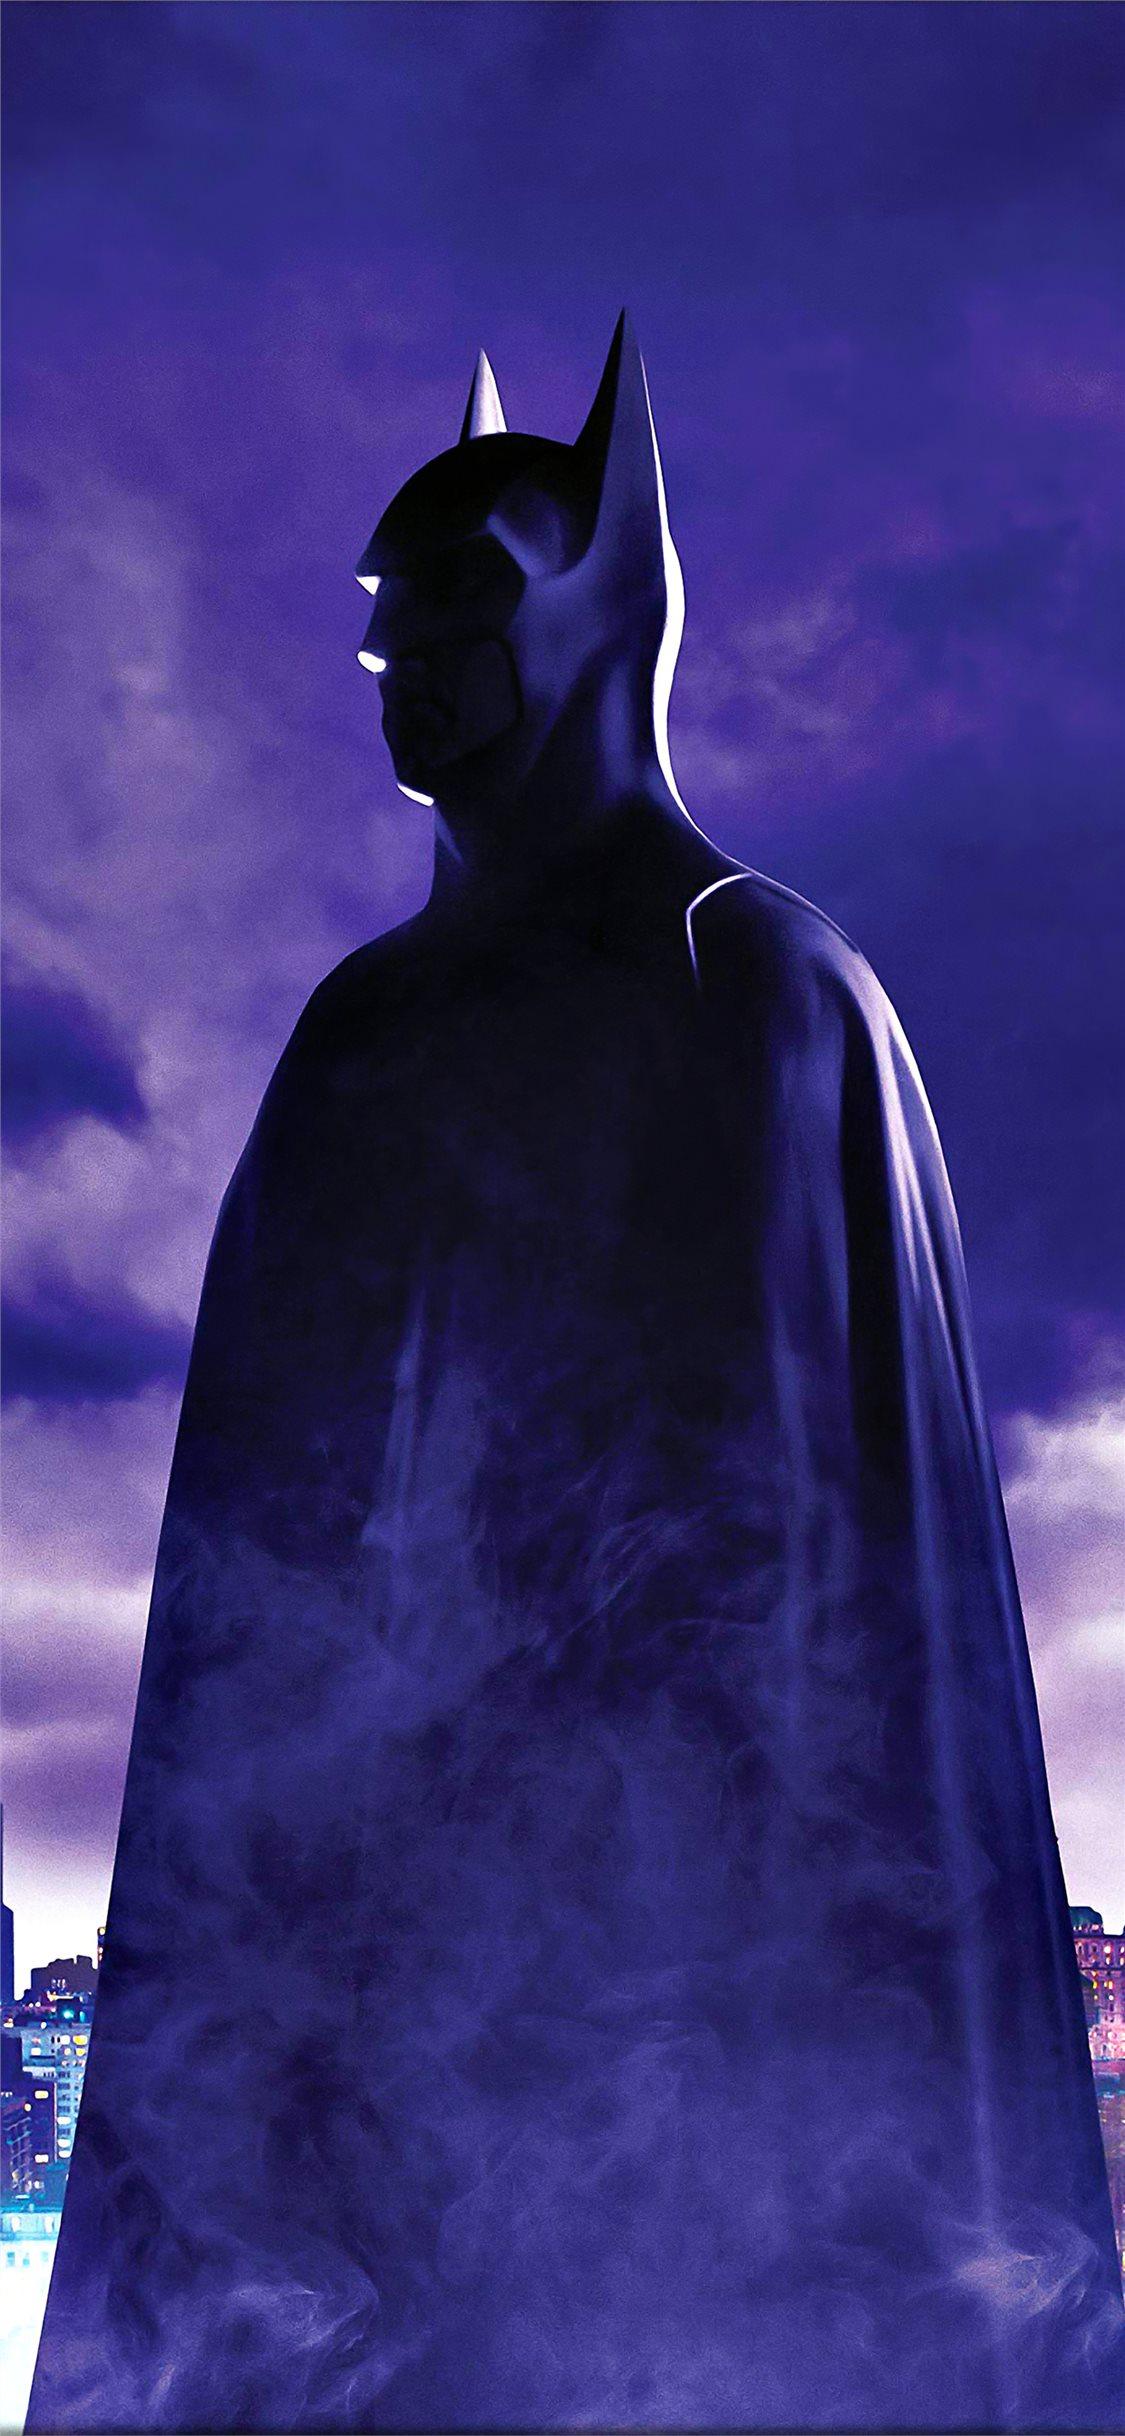 Batman Returns 1992 Iphone X Wallpapers Free Download